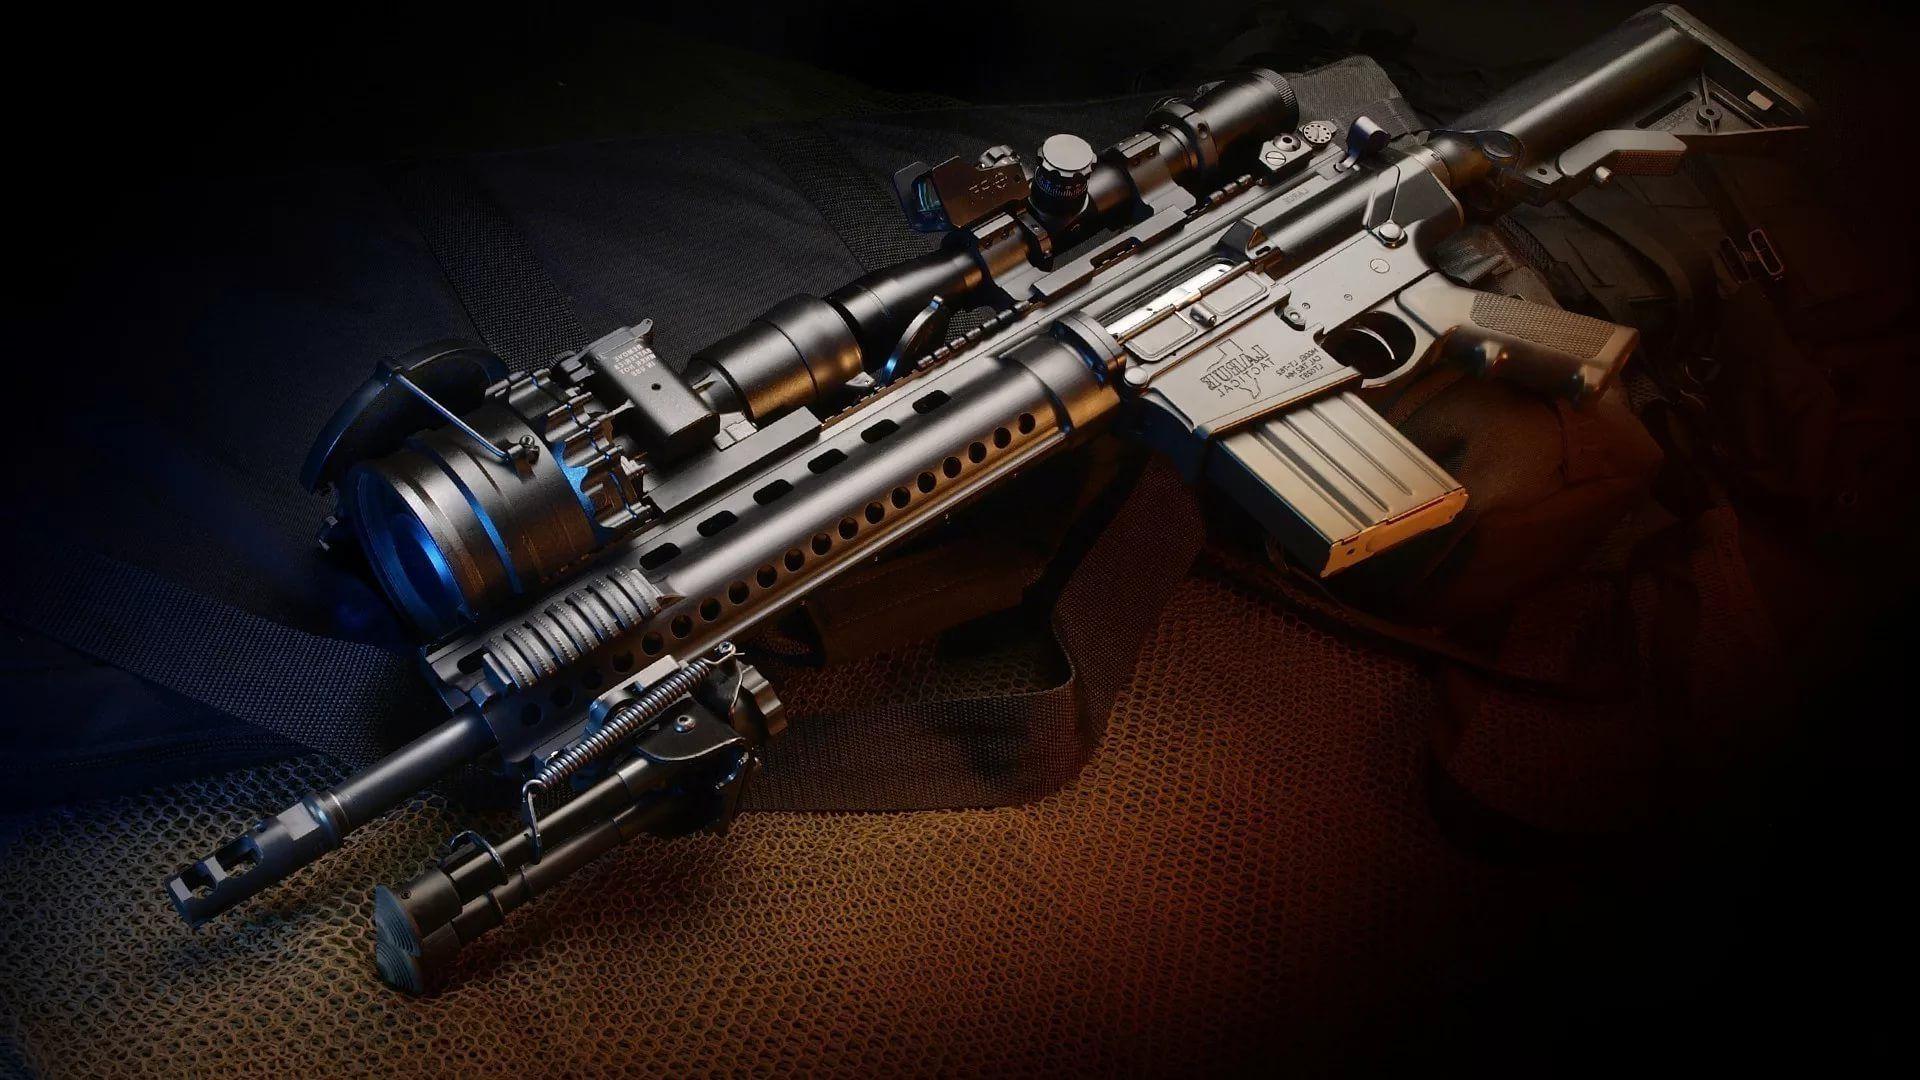 Gun For Desktop full hd wallpaper